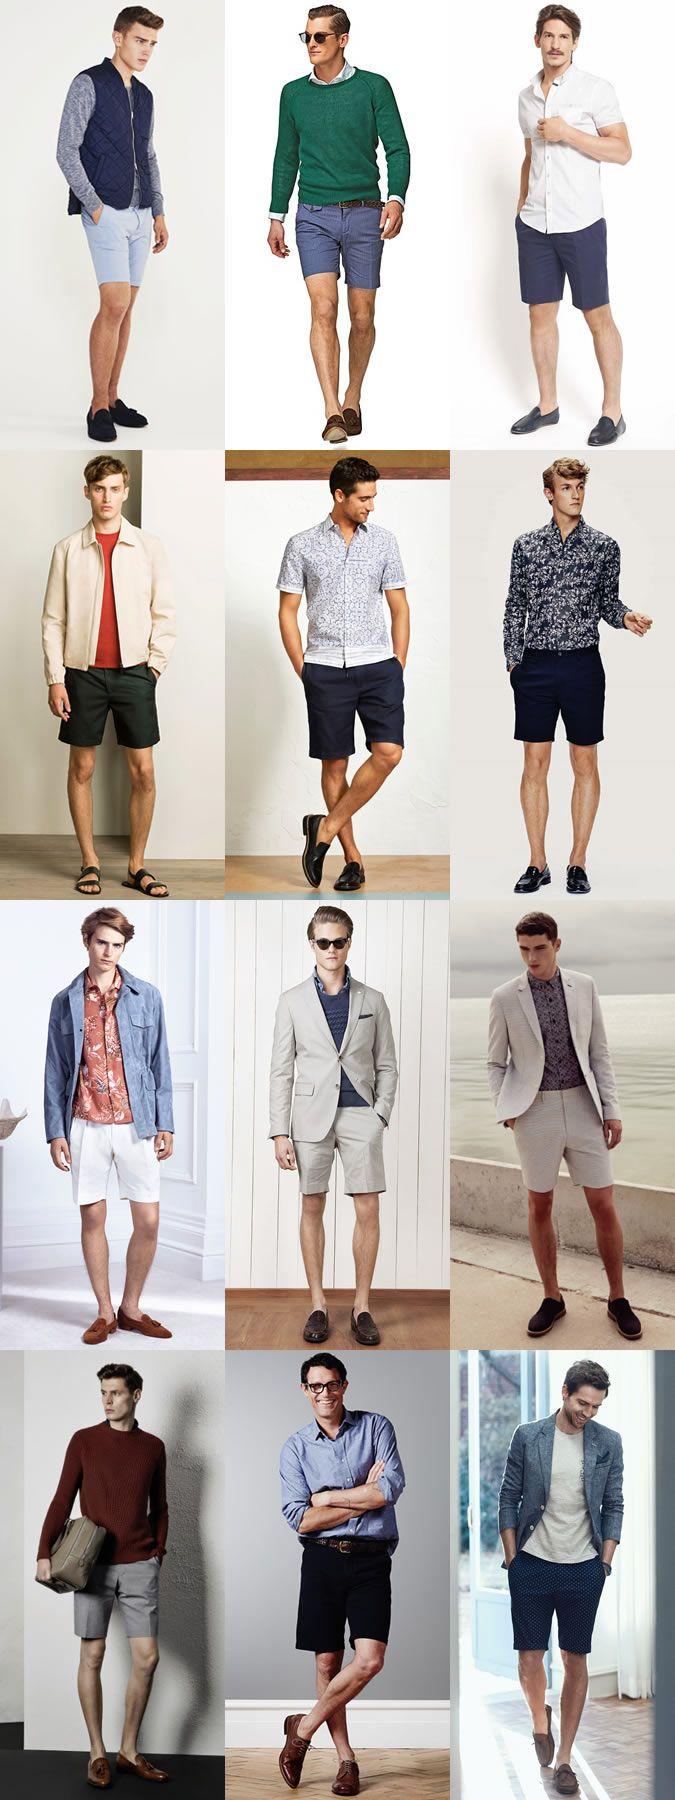 Short & Shoes Combinations